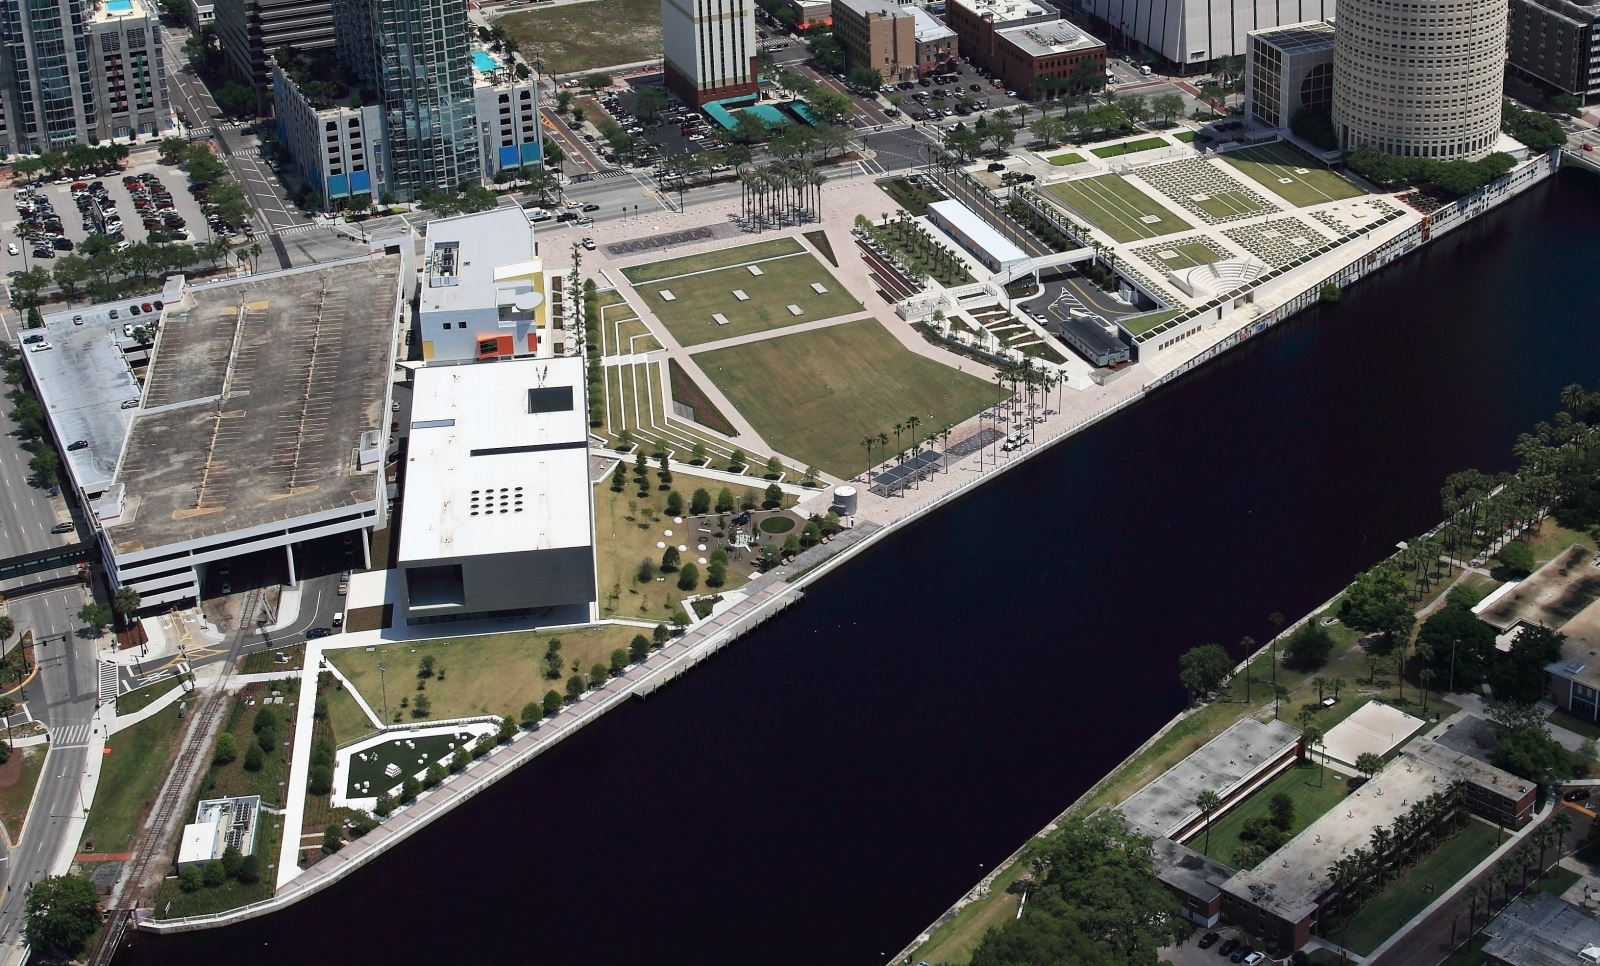 Curtis Hixon property today. The Tampa River Walk runs along the bay.